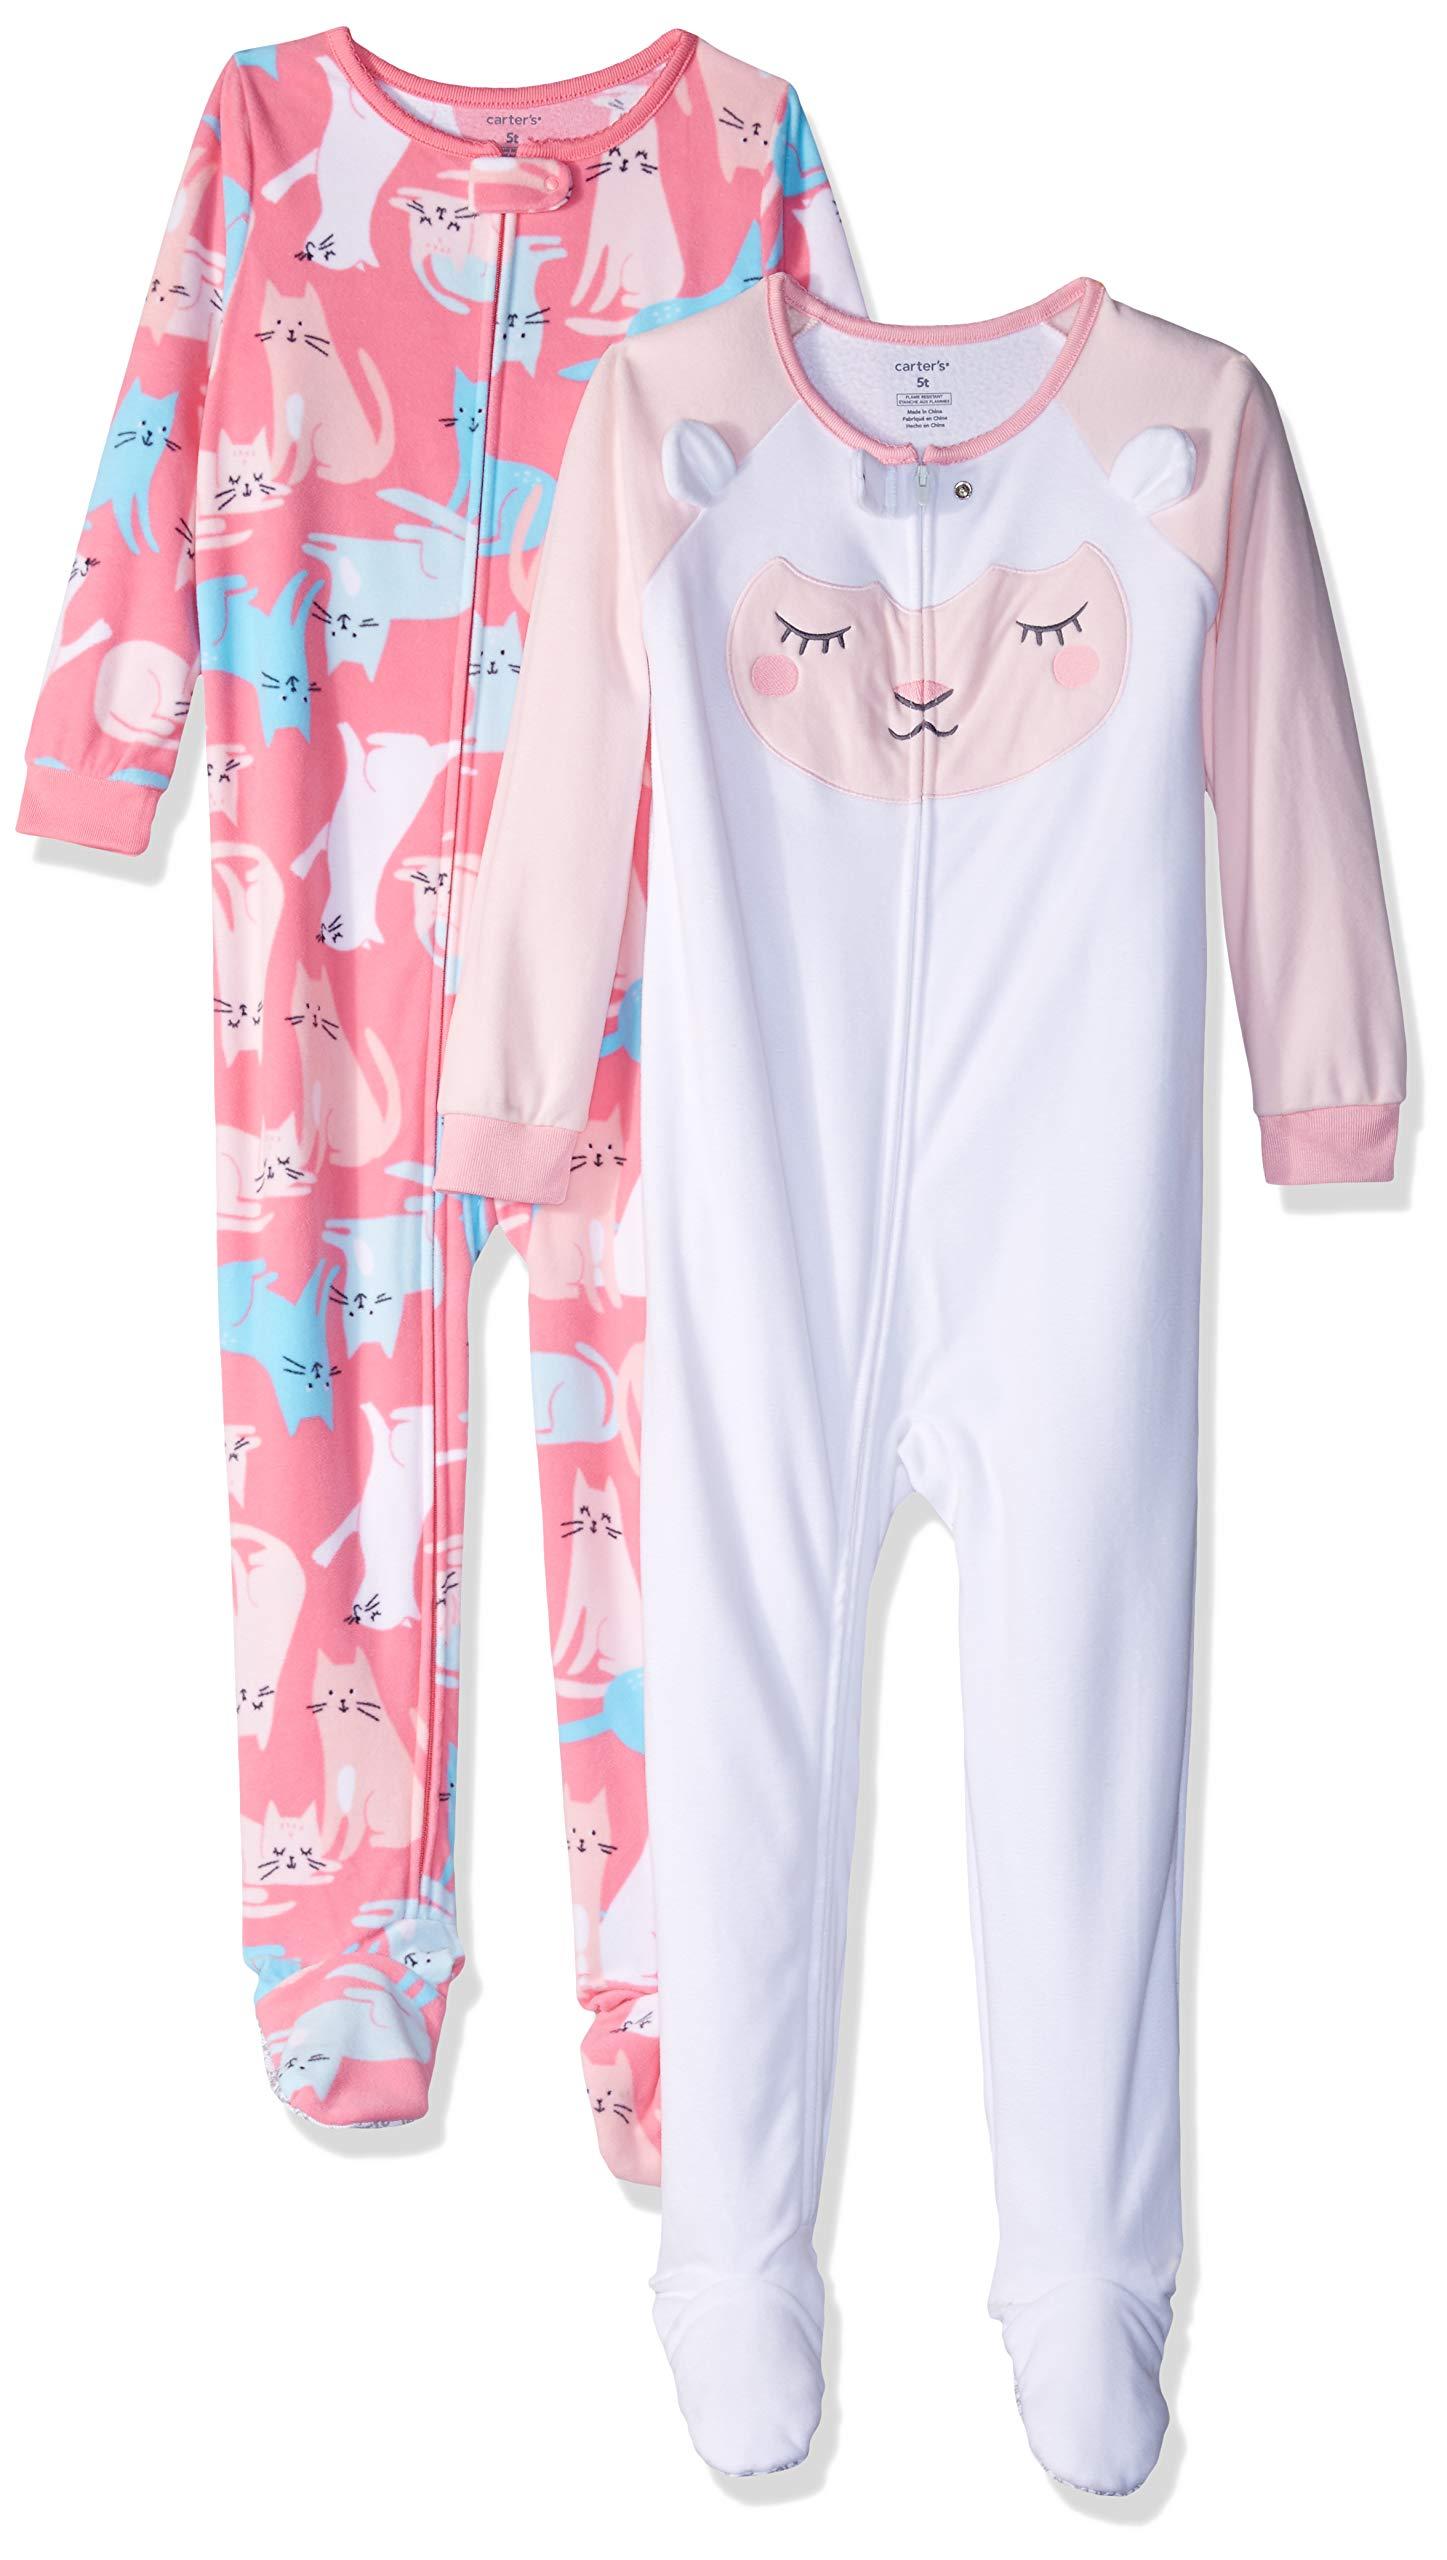 Baby Climbing Clothes Romper Cartoon Raccoon Infant Playsuit Bodysuit Creeper Onesies Pink